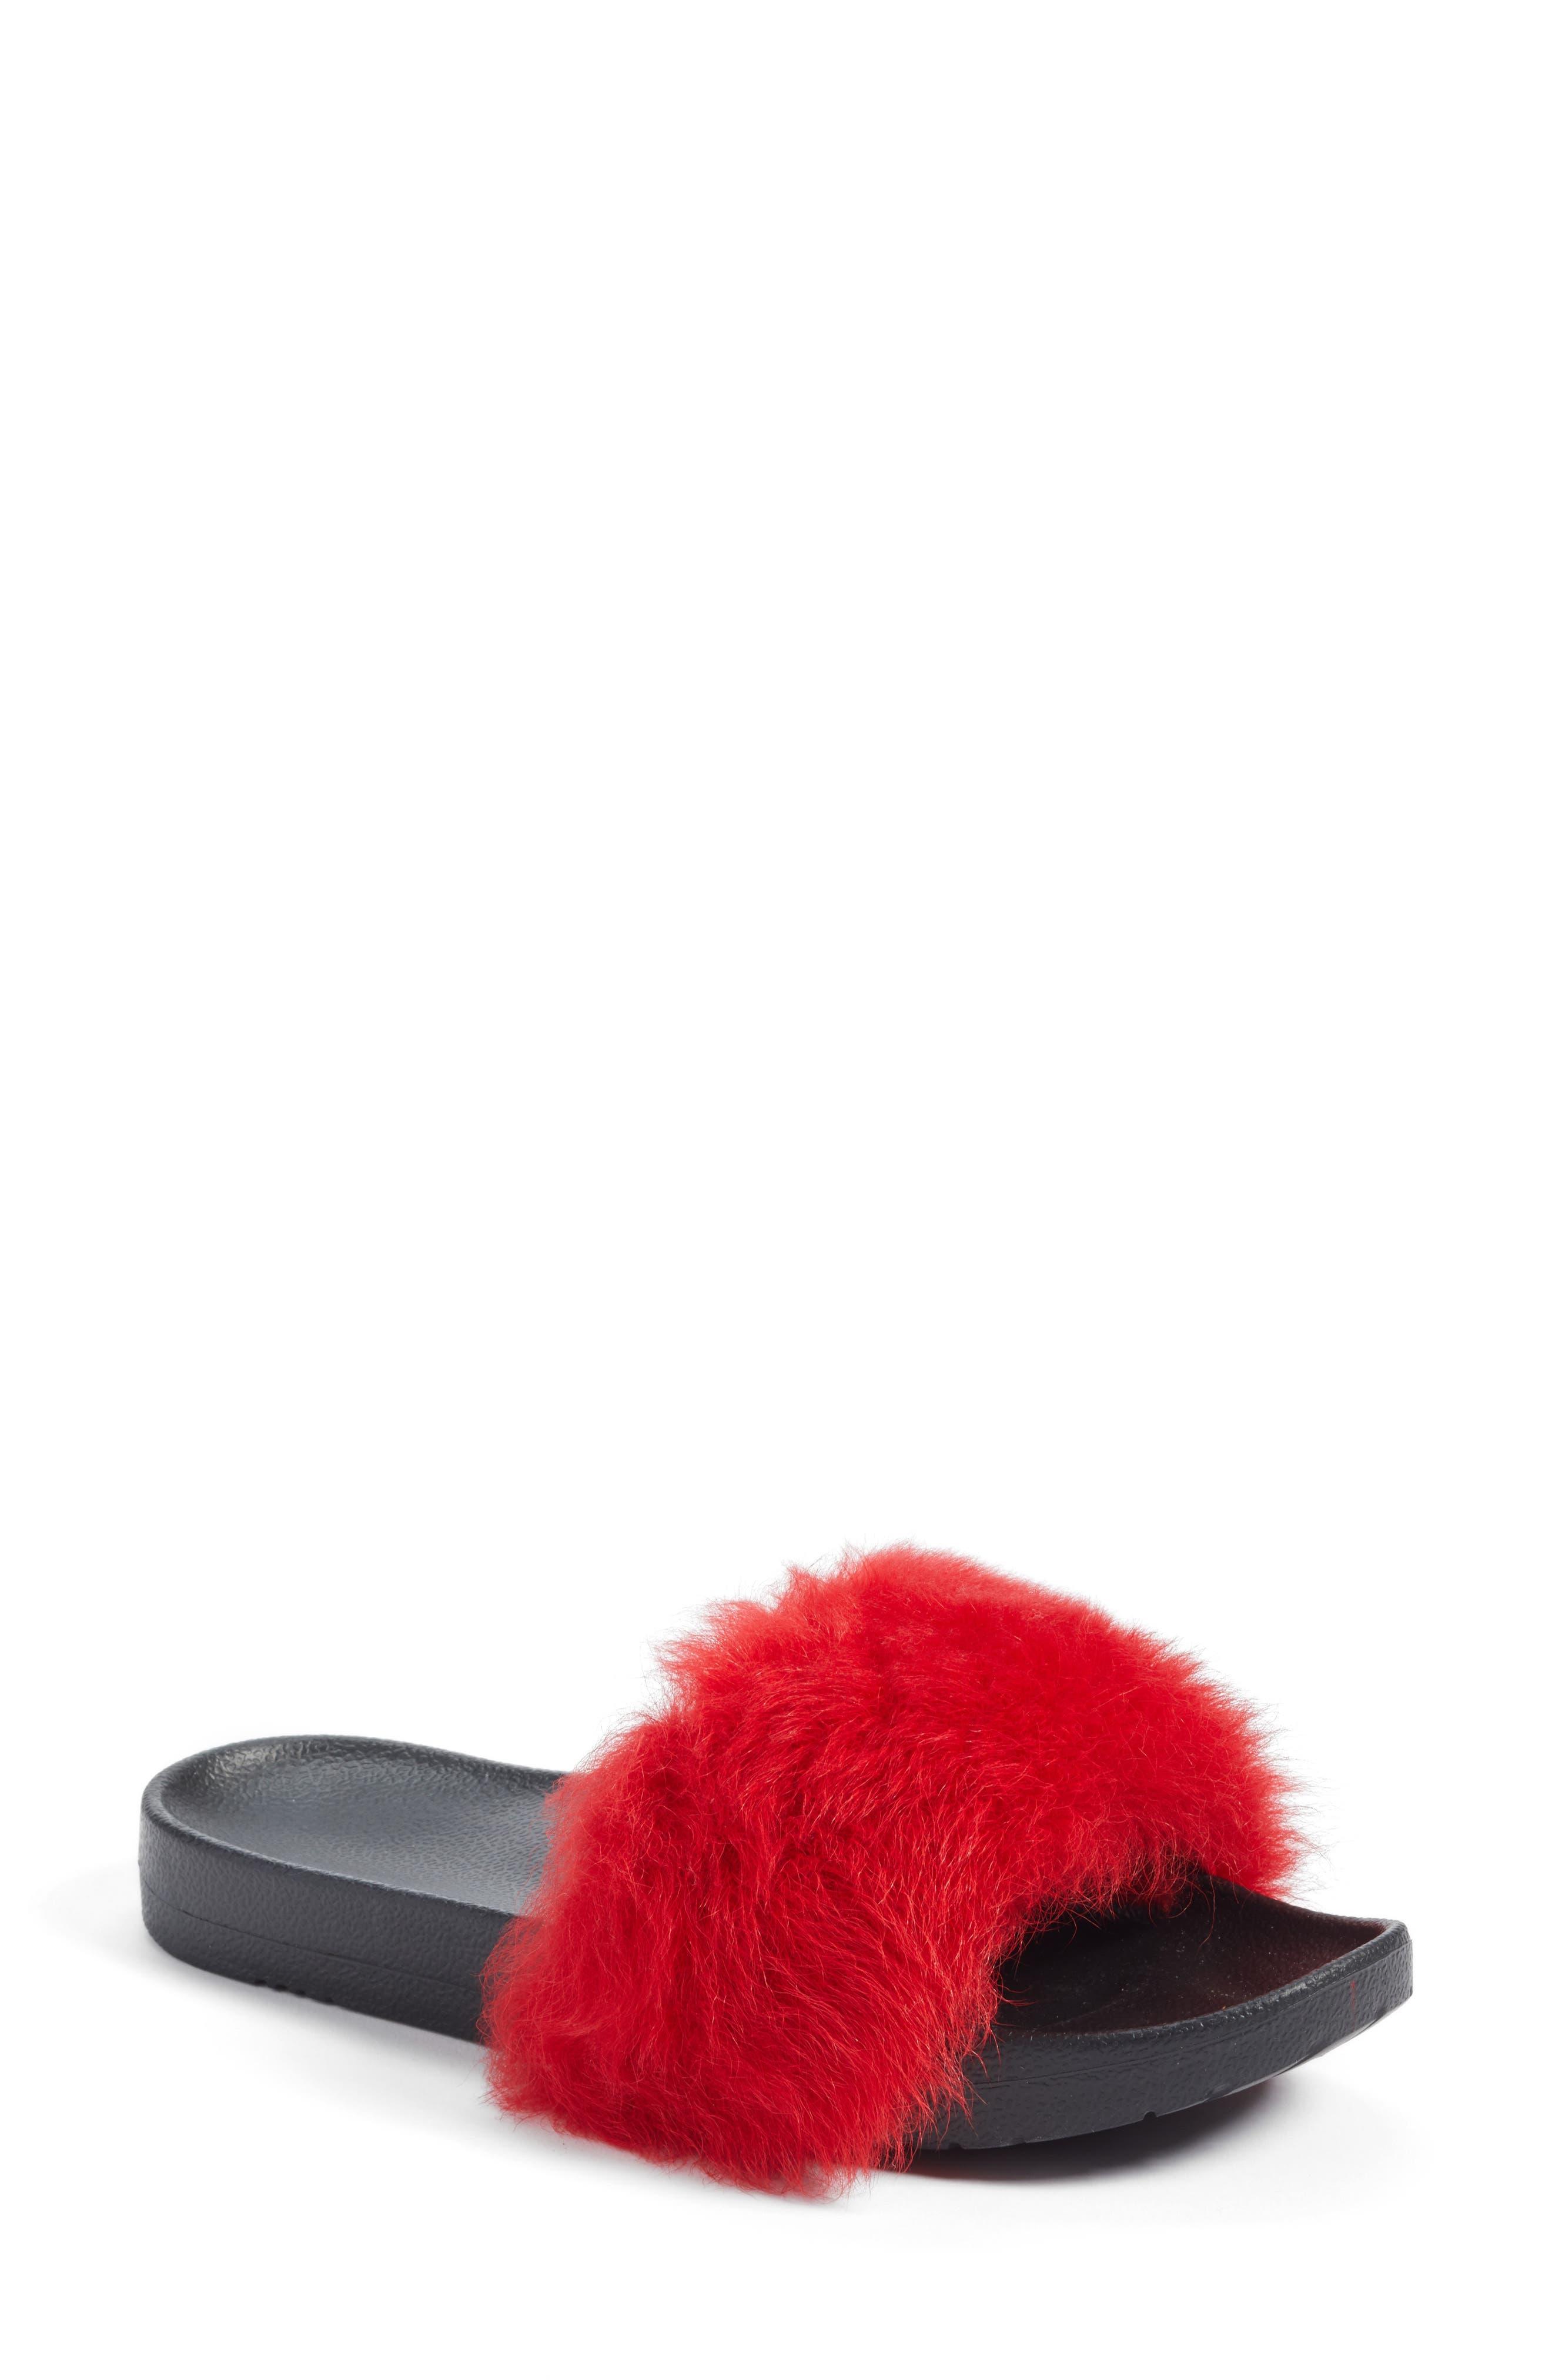 Royale Genuine Shearling Slide Sandal,                         Main,                         color, 627